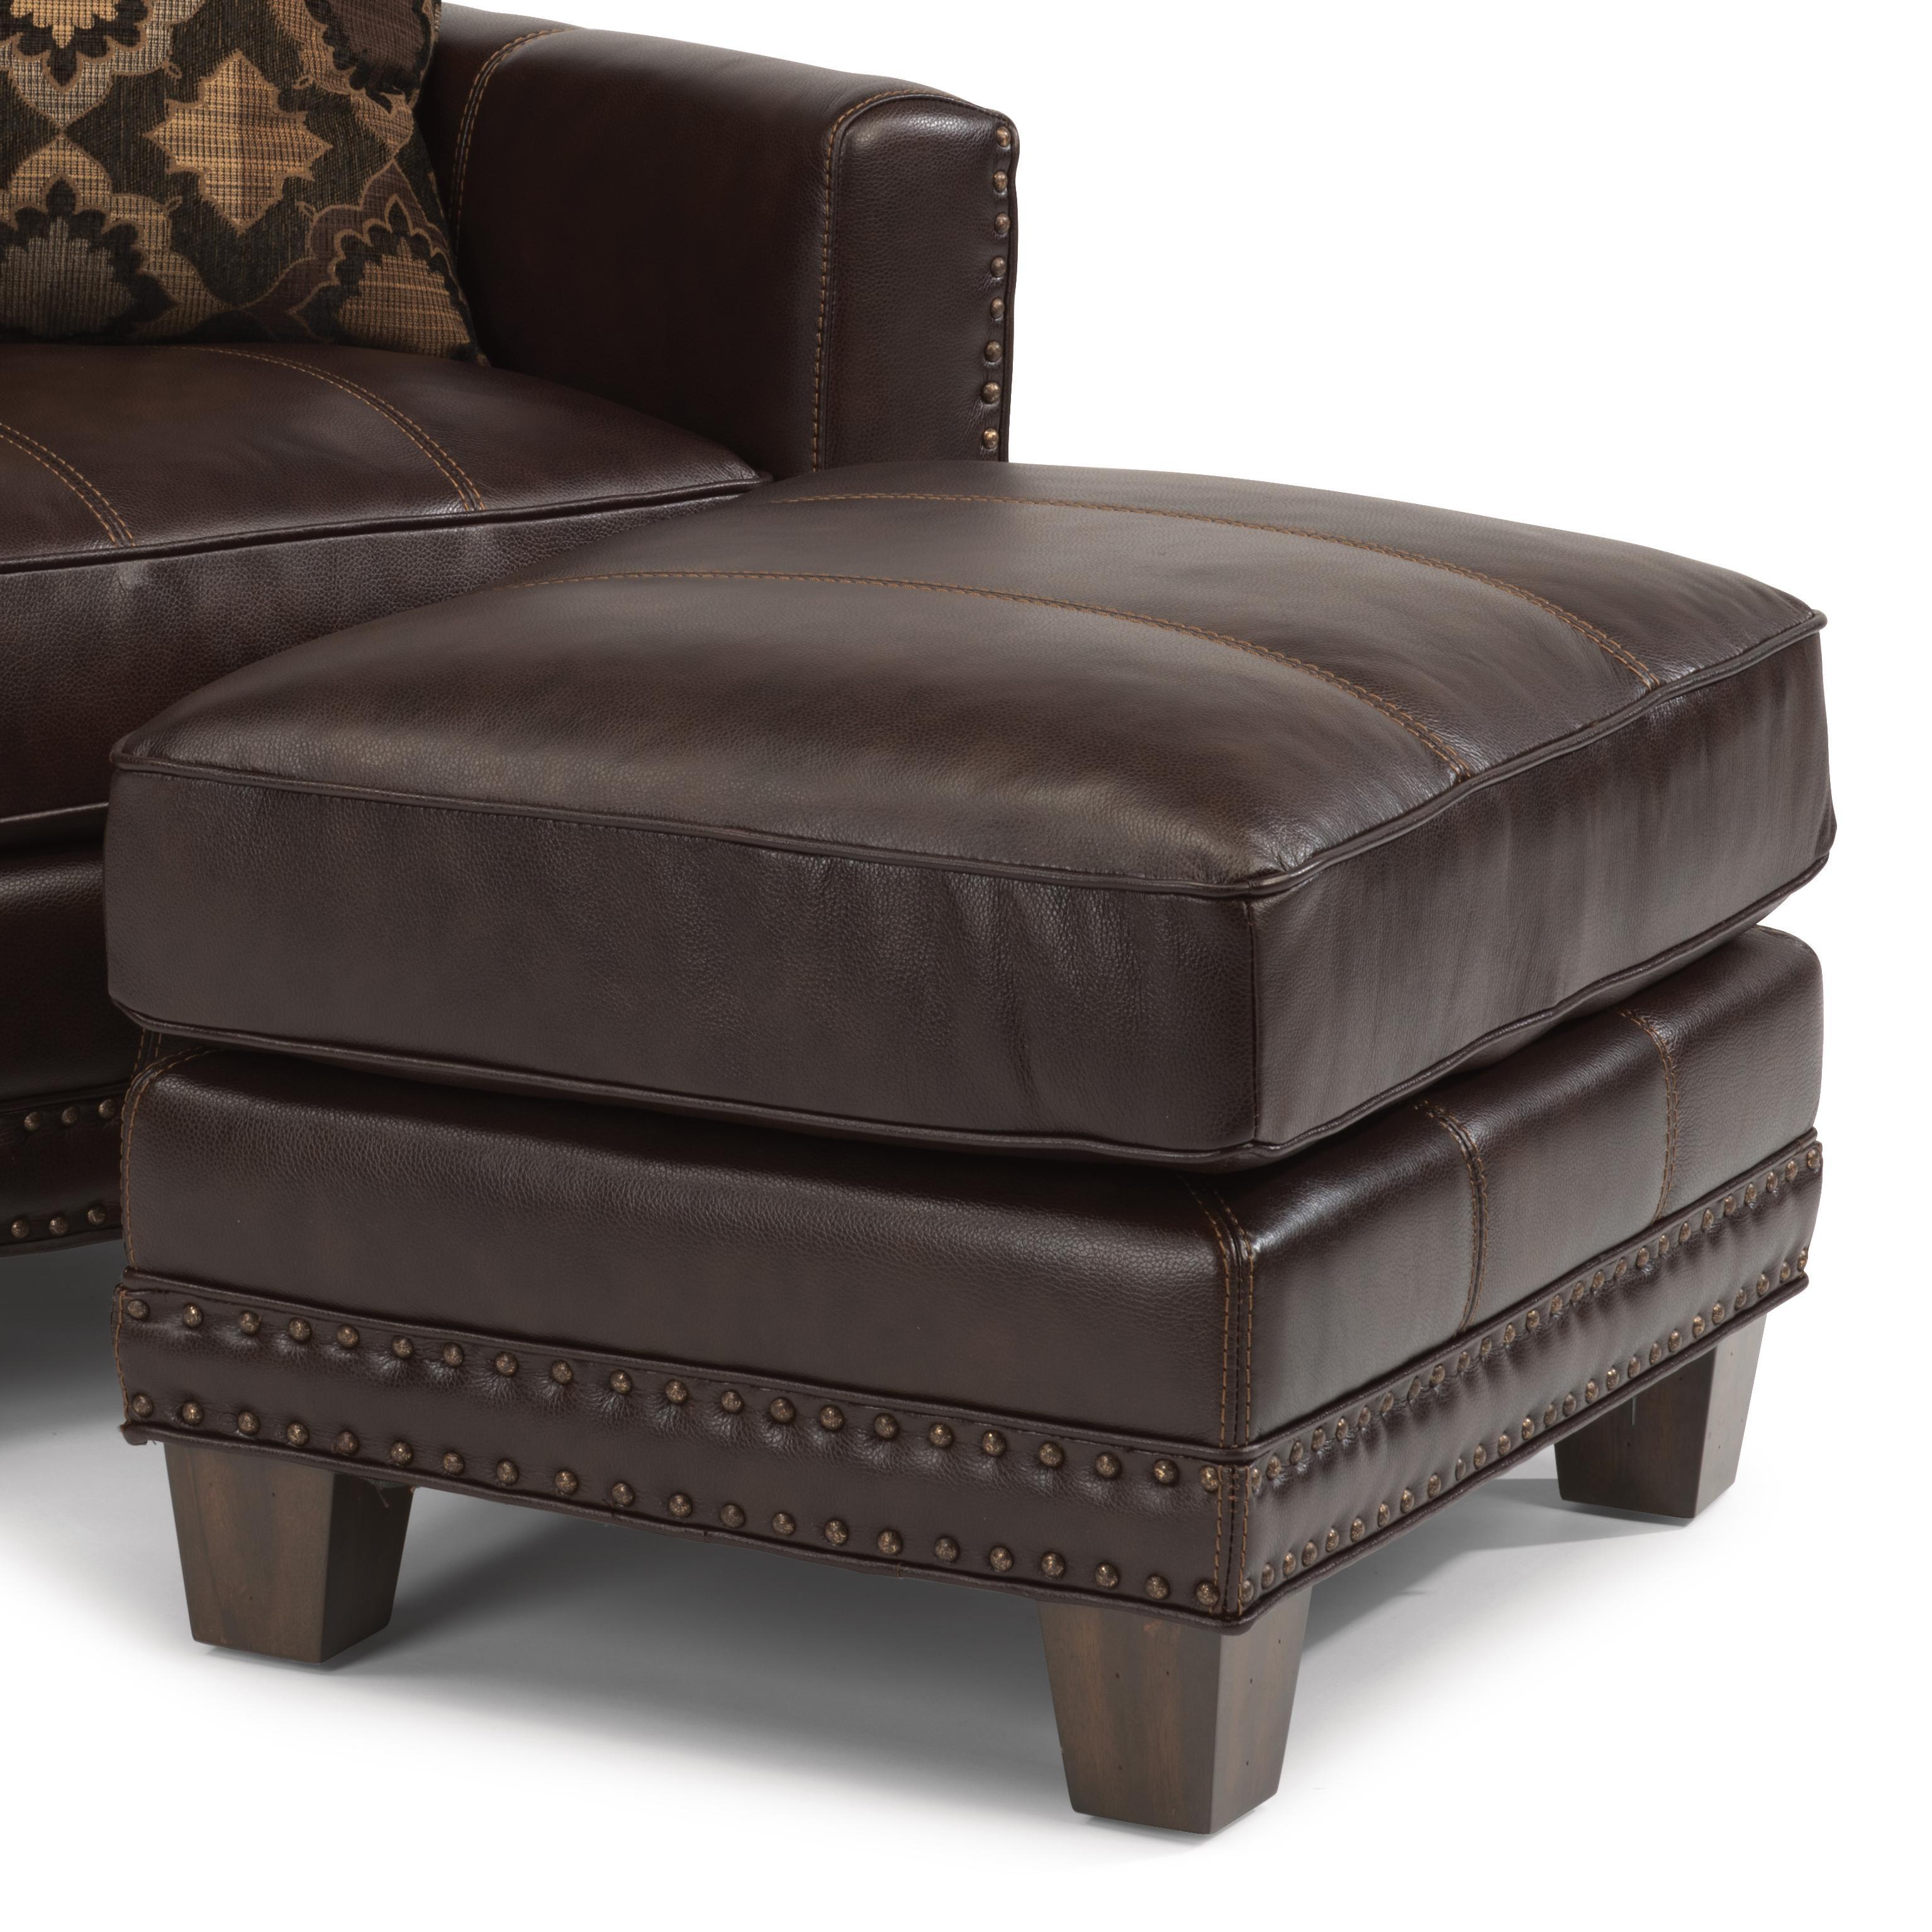 Latitudes - Port Royal Ottoman by Flexsteel at Walker's Furniture